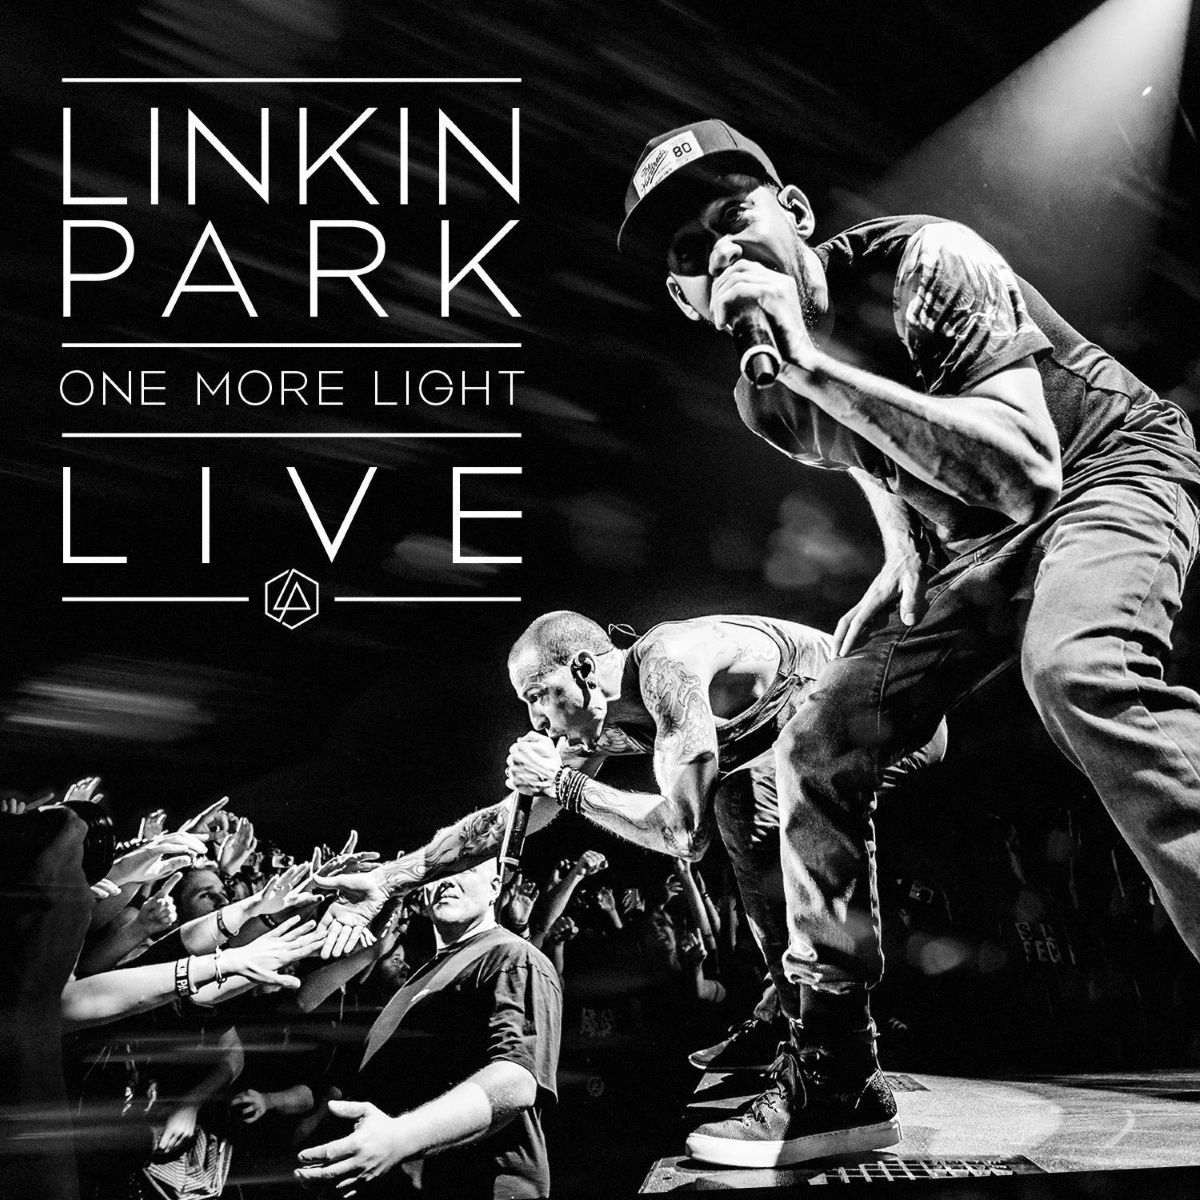 Linkin Park – One More Light Live (CD)One More Light Live – концертный альбом Linkin Park, посвященный памяти солиста Честера Беннингтона.<br>